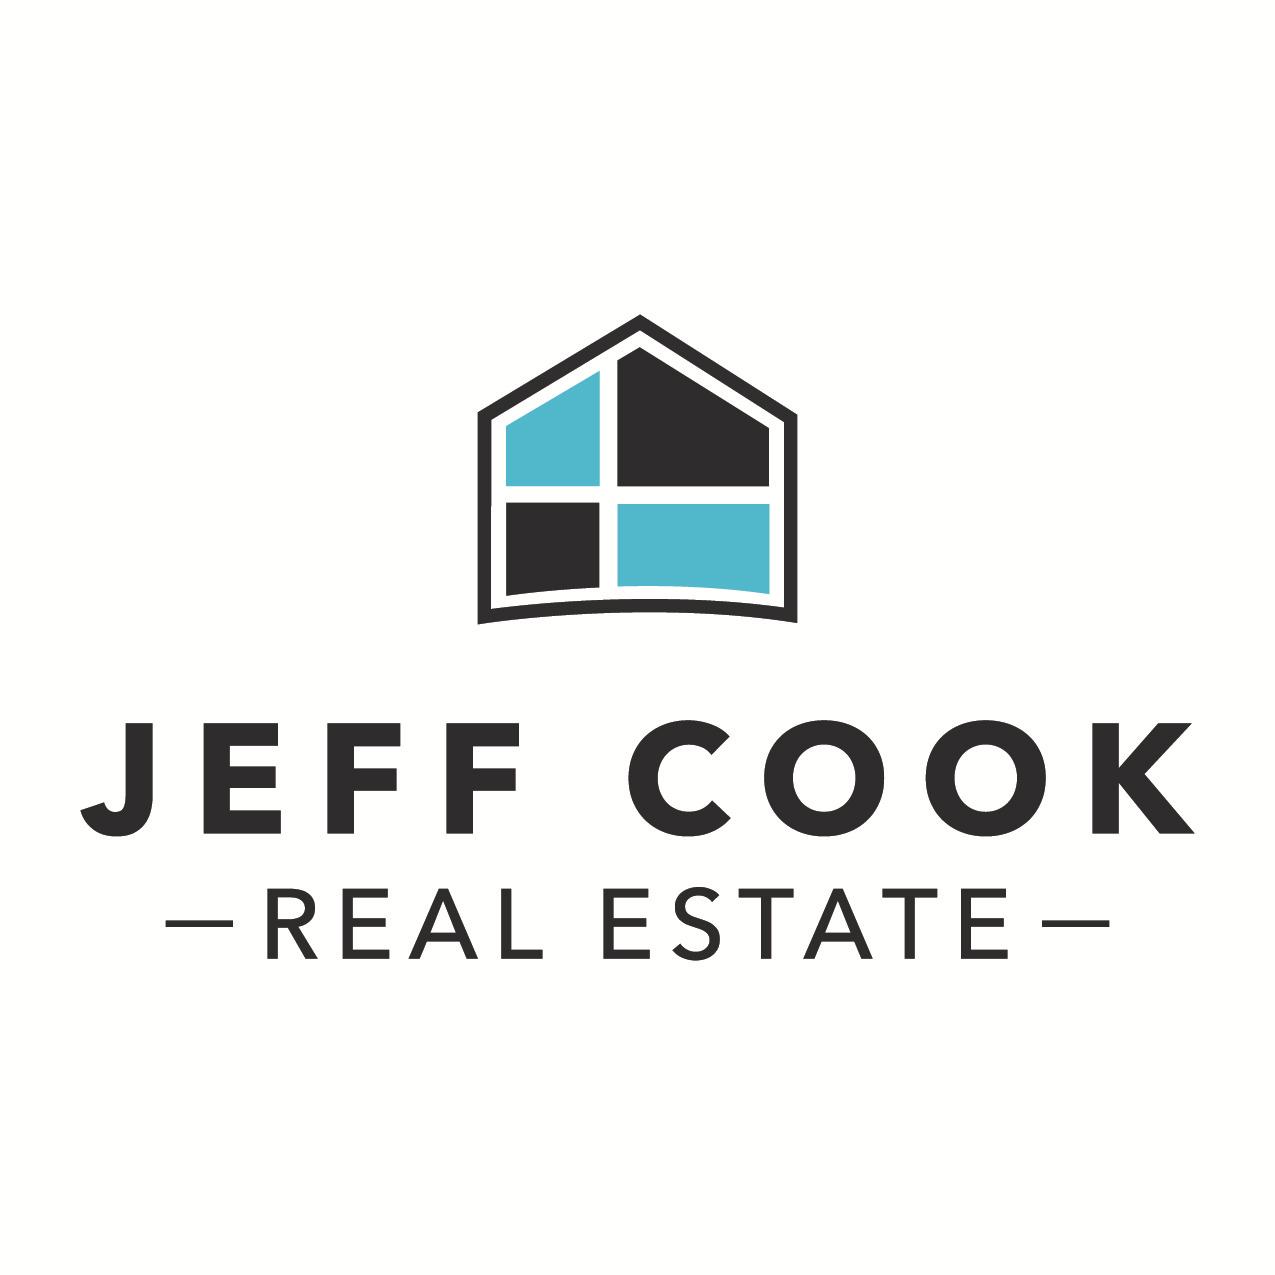 Jeff Cook Real Estate Company Logo